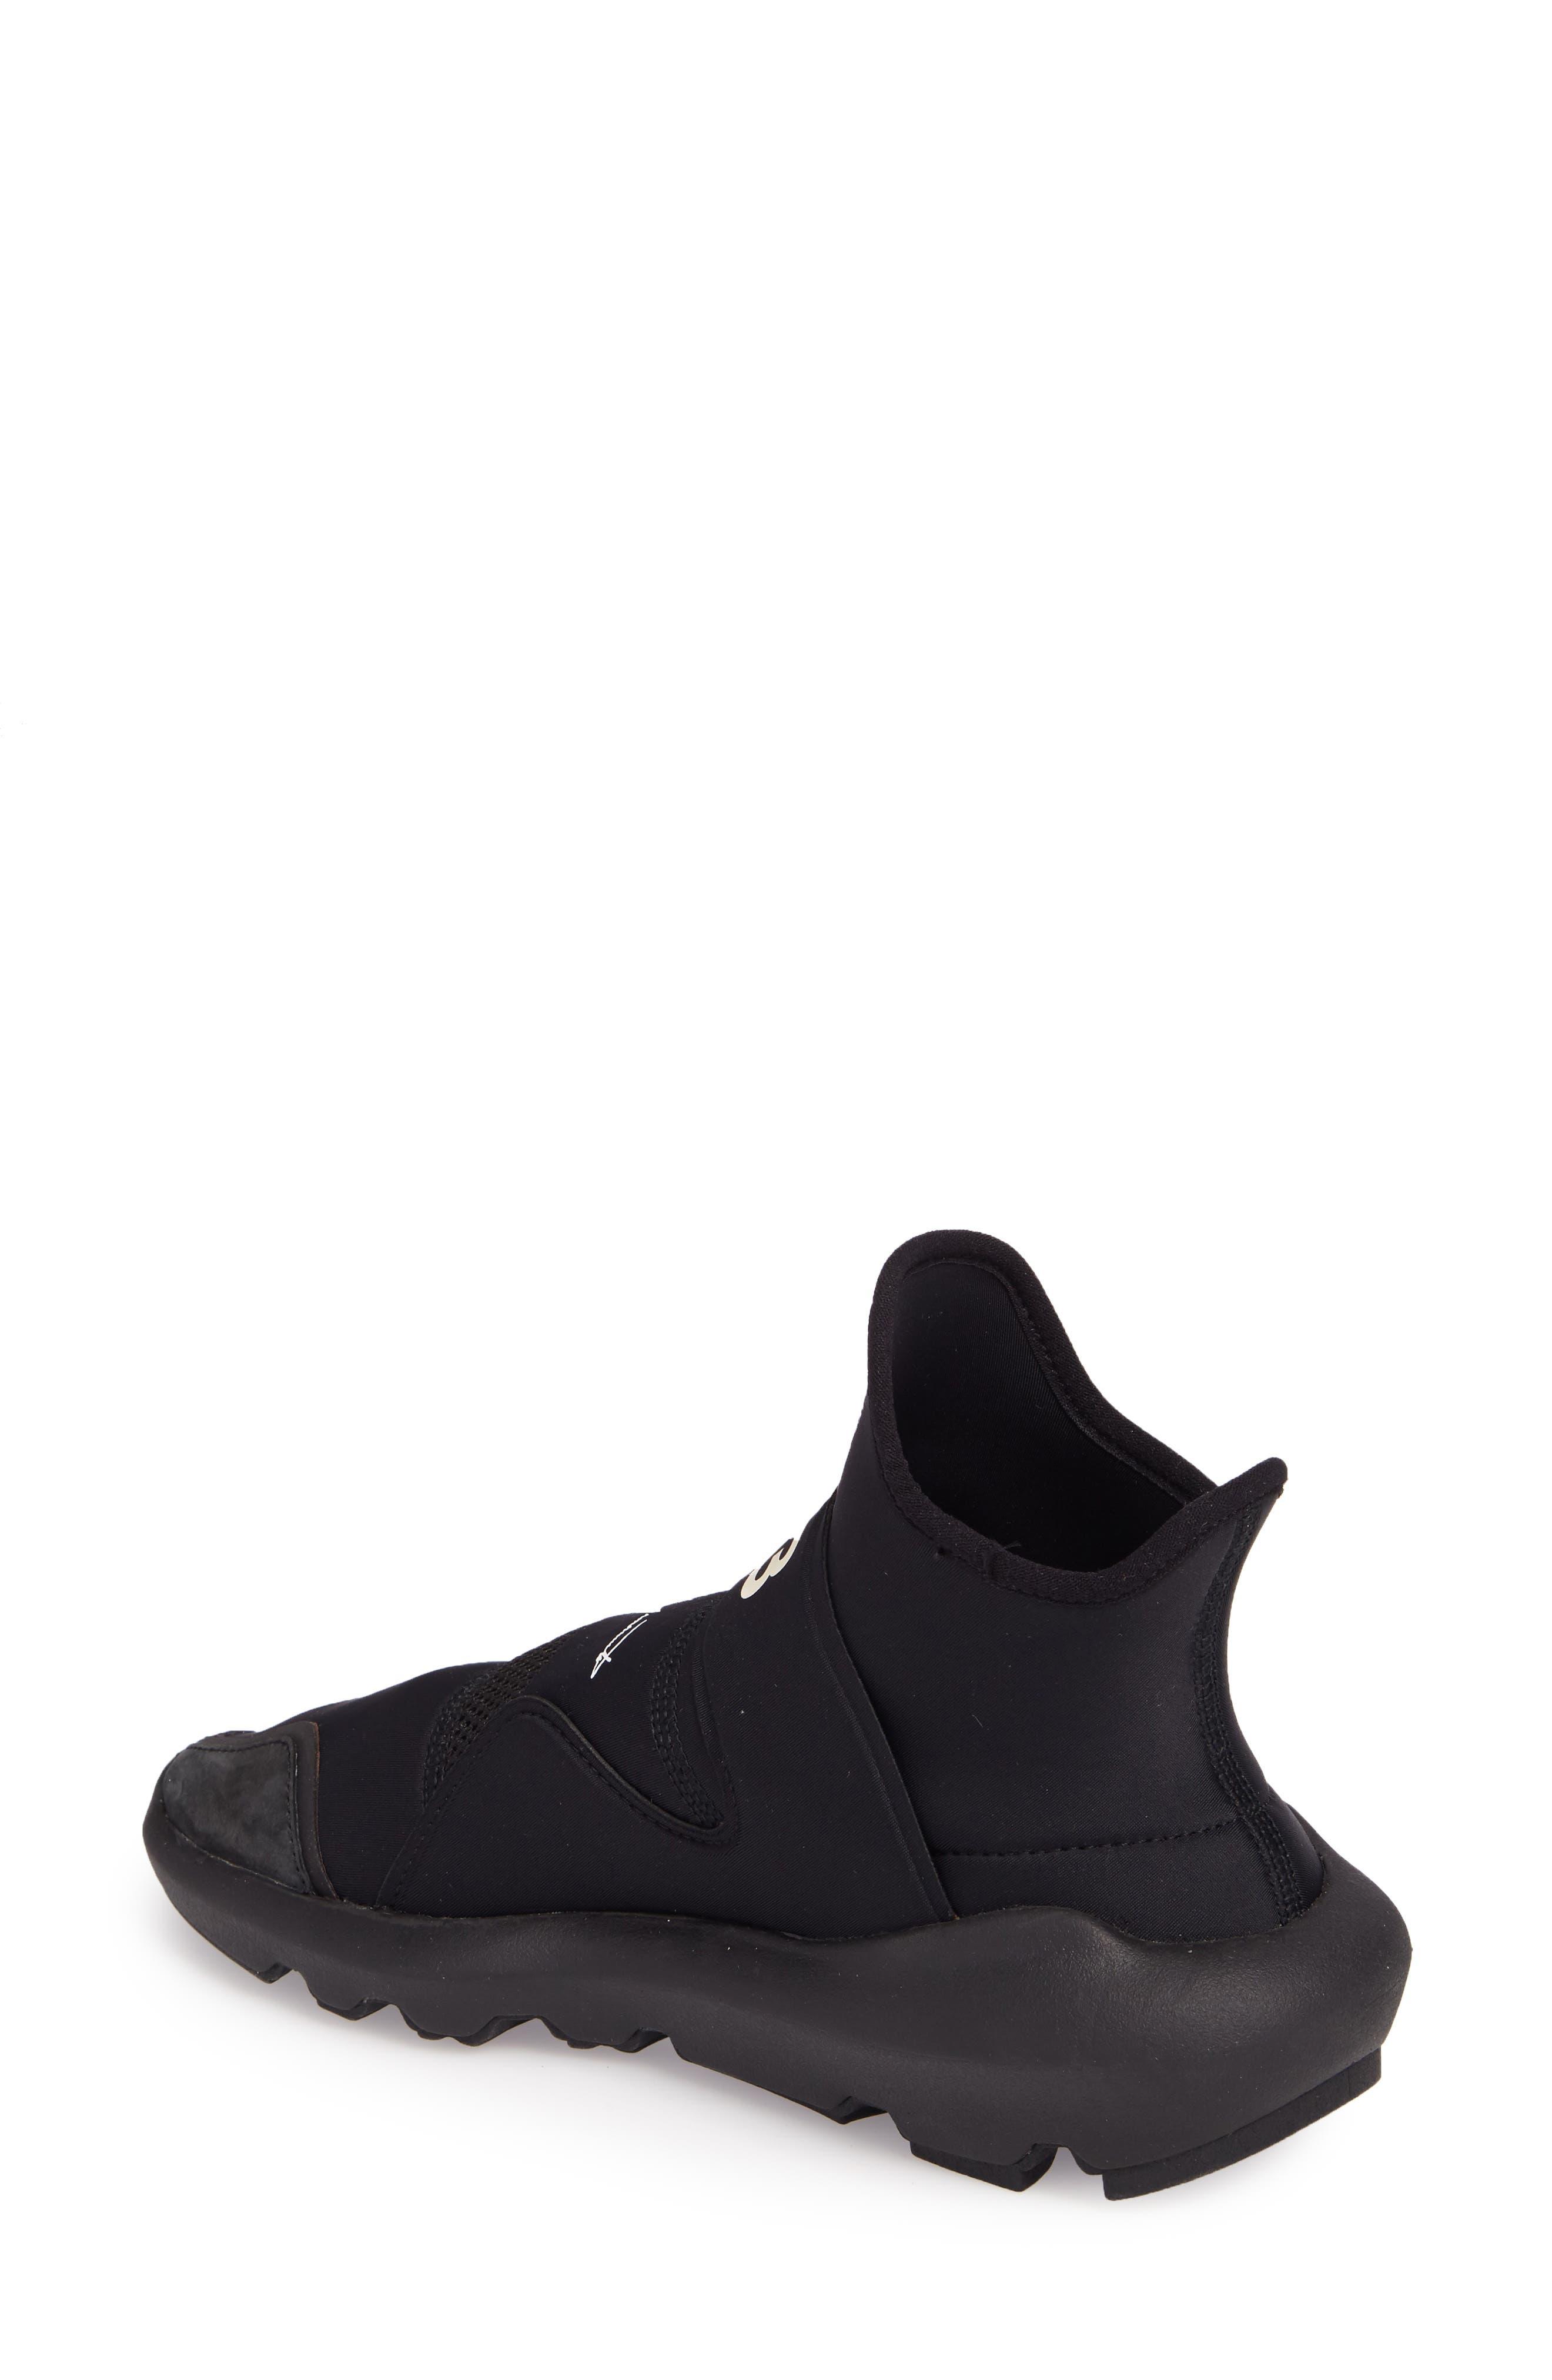 Superbou Sneaker,                             Alternate thumbnail 3, color,